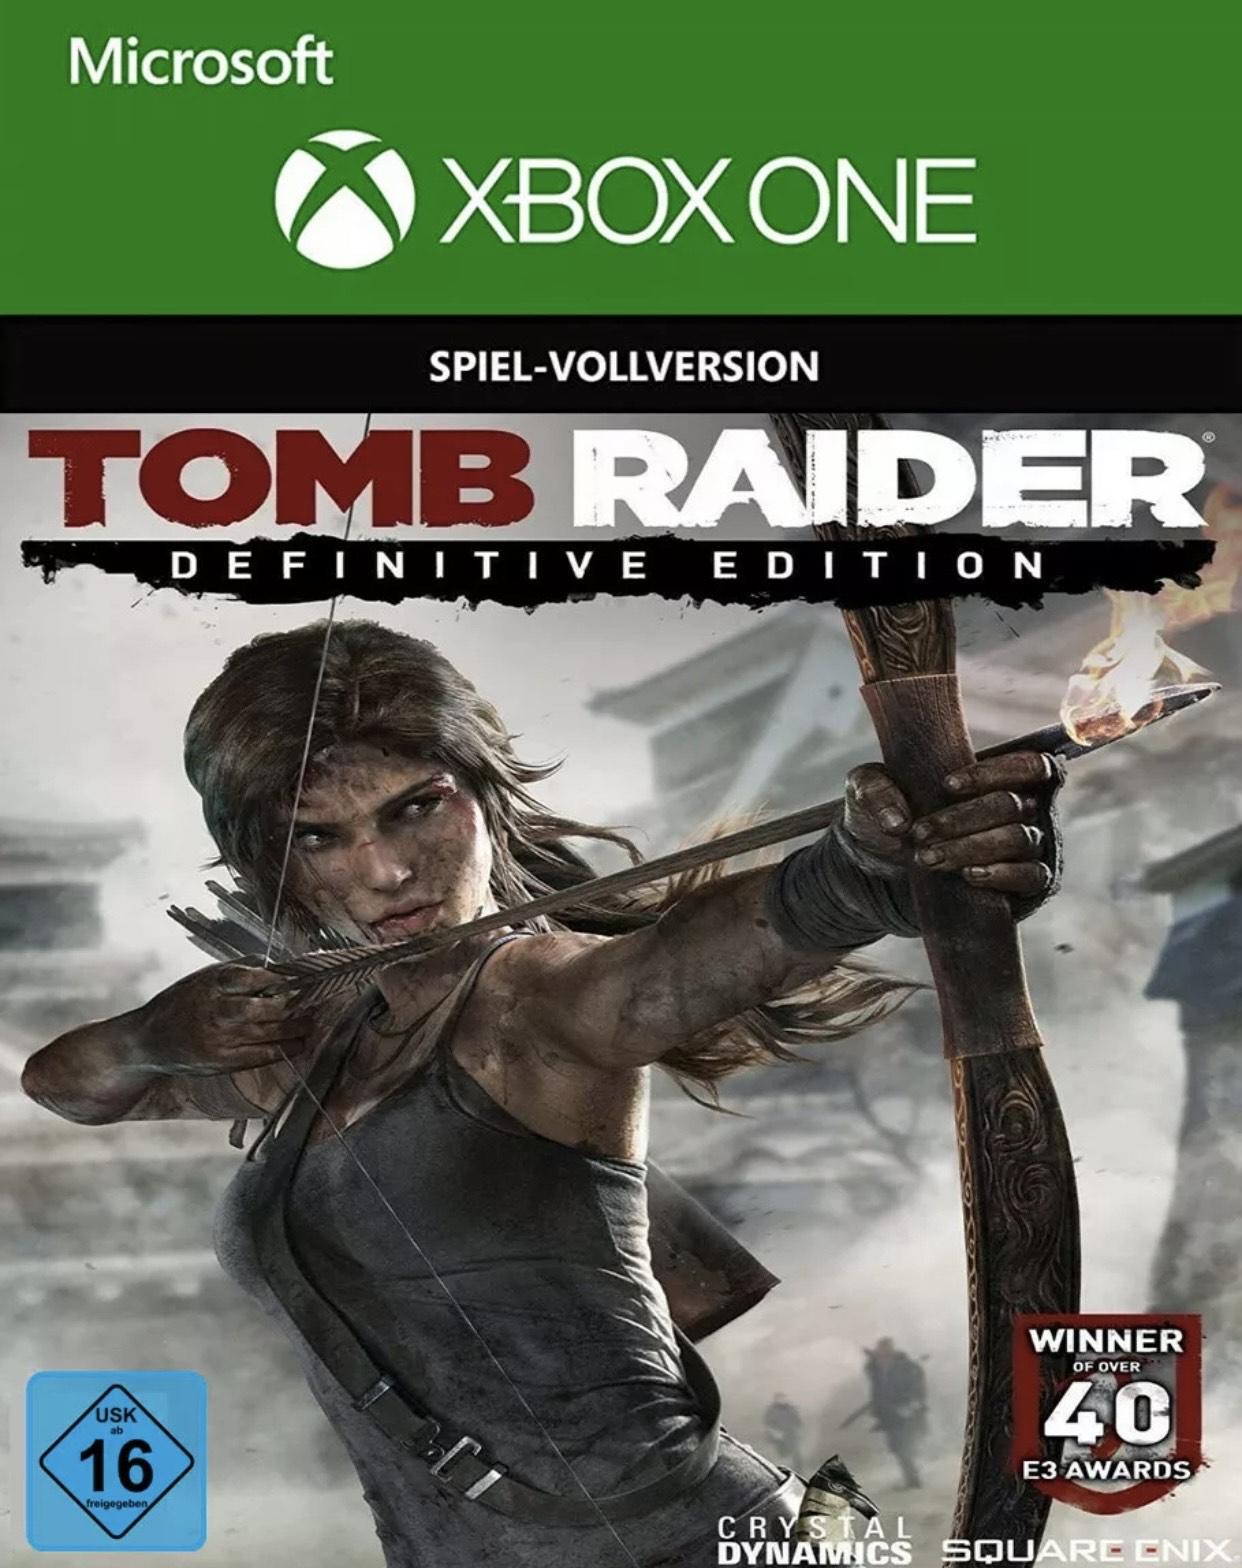 Tomb Raider: Definitive Edition (Xbox One / Series S&X im Microsoft Store)